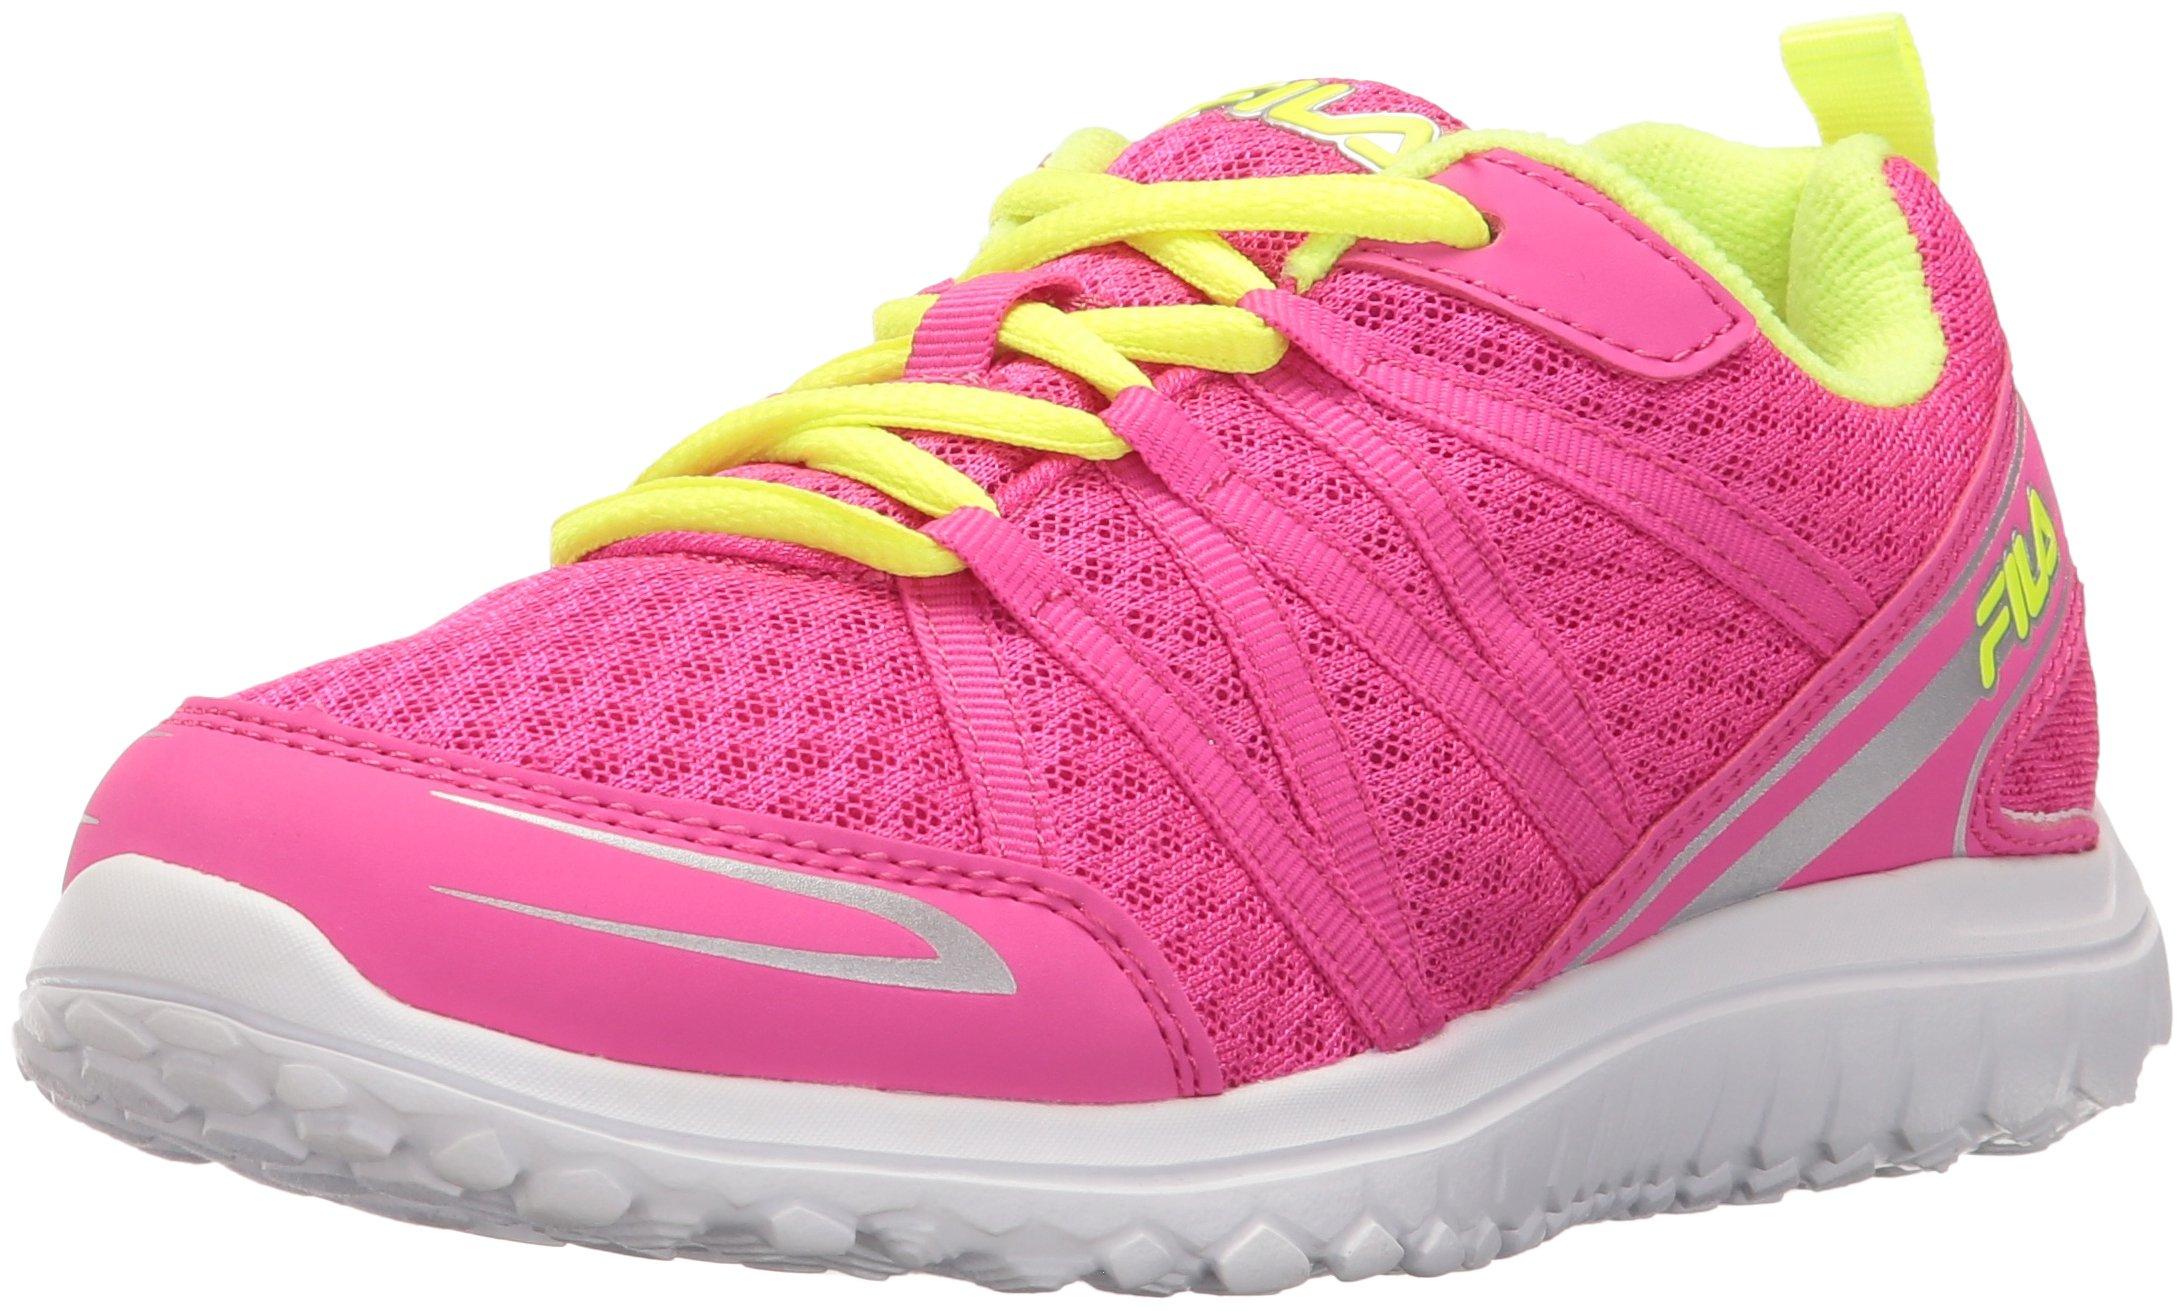 Fila Girls' FLYVER Skate Shoe Pink Glo/Safety Yellow/Metallic Silver 10.5 M US Little Kid